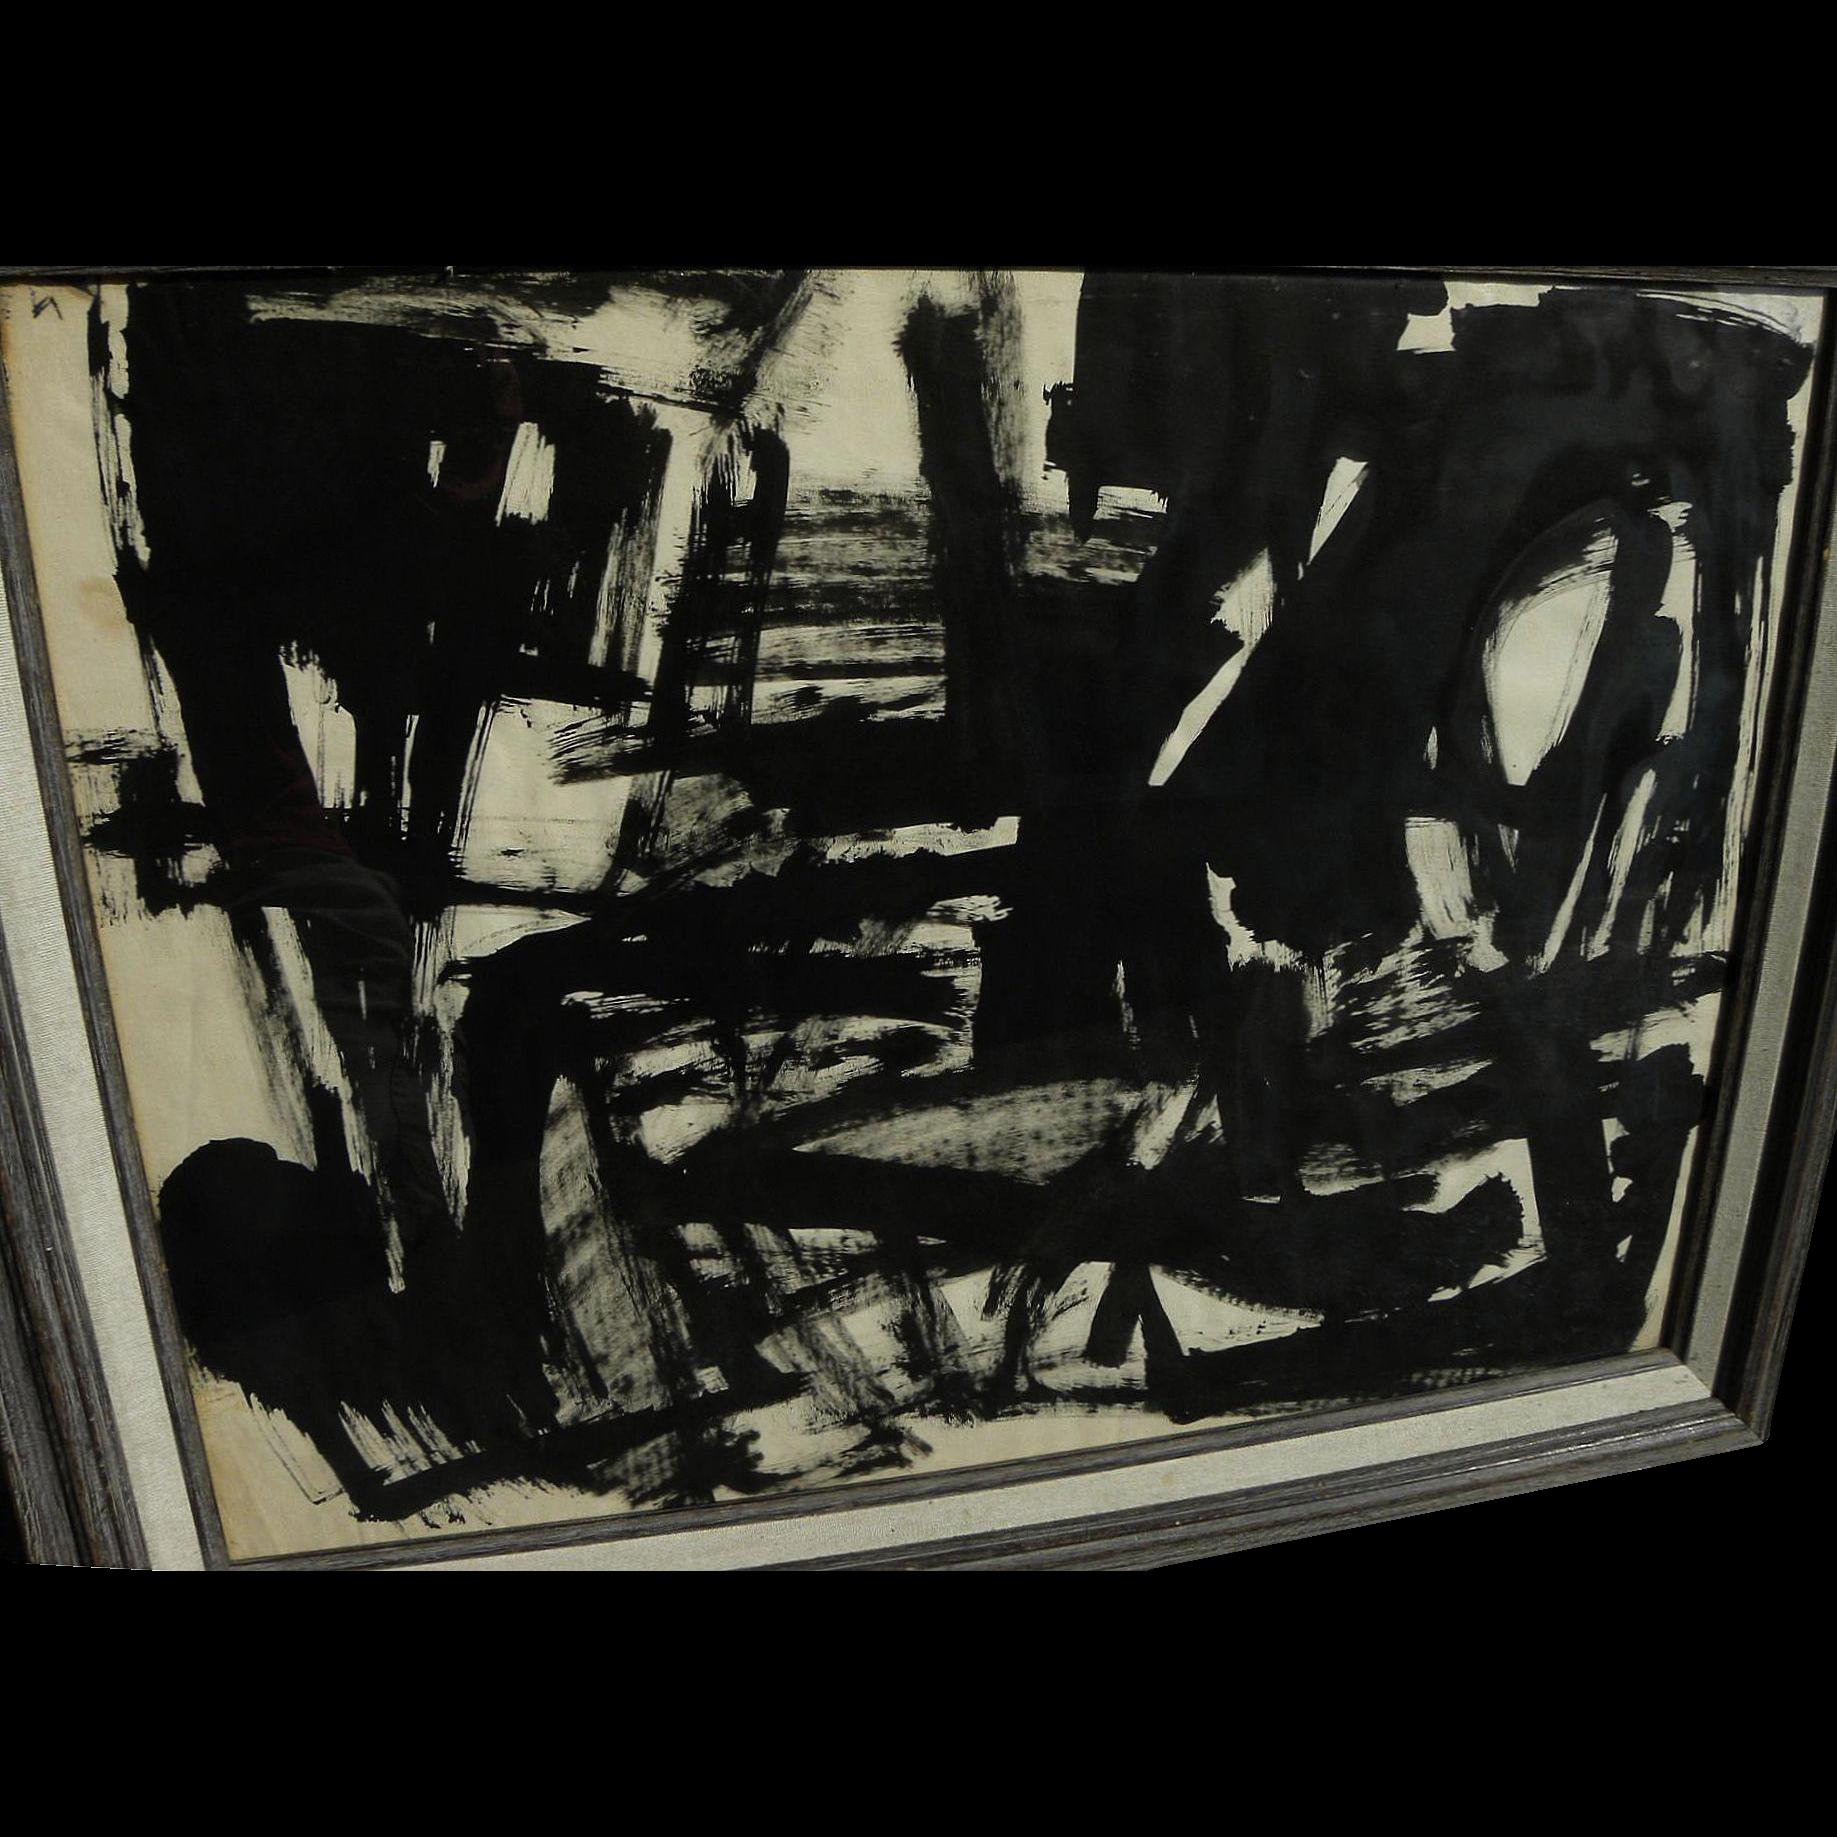 EUGENIO DE BERNARD-KURAKIN (1918-) dramatic black and white abstract watercolor by Spanish-born Santa Fe artist